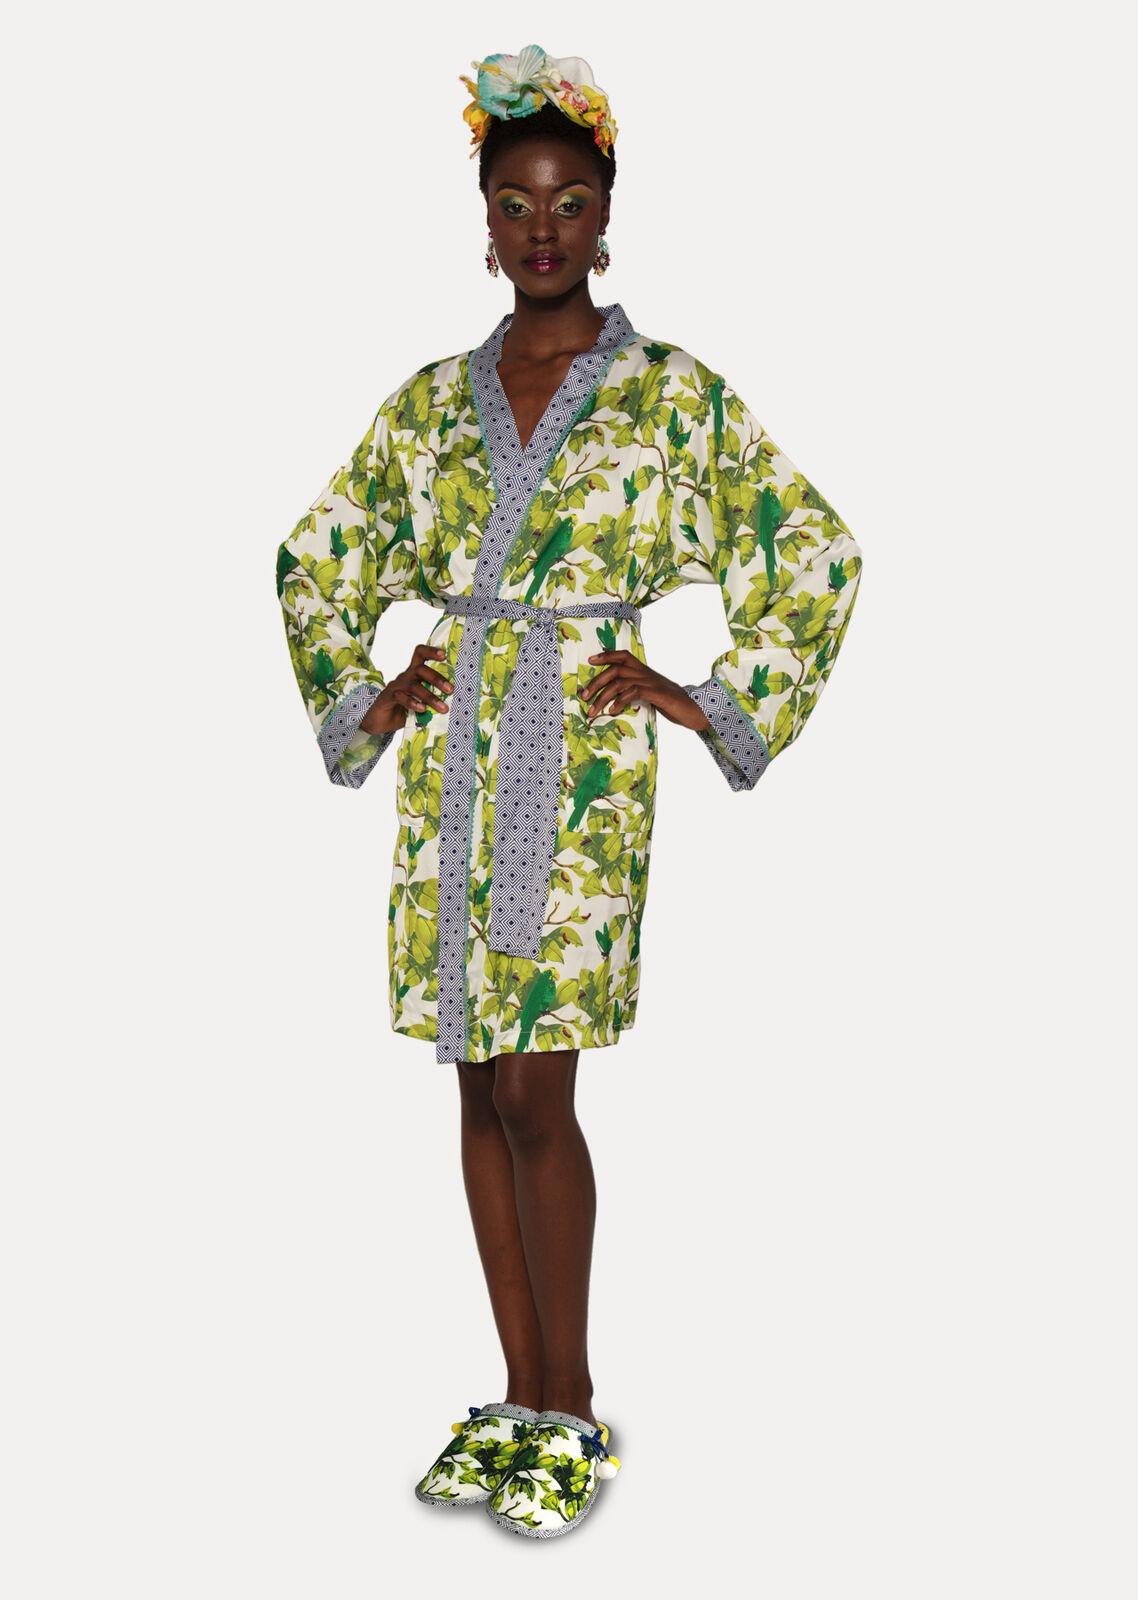 Frida Kahlo Bonito Satin Women's Dressing Gown Robe